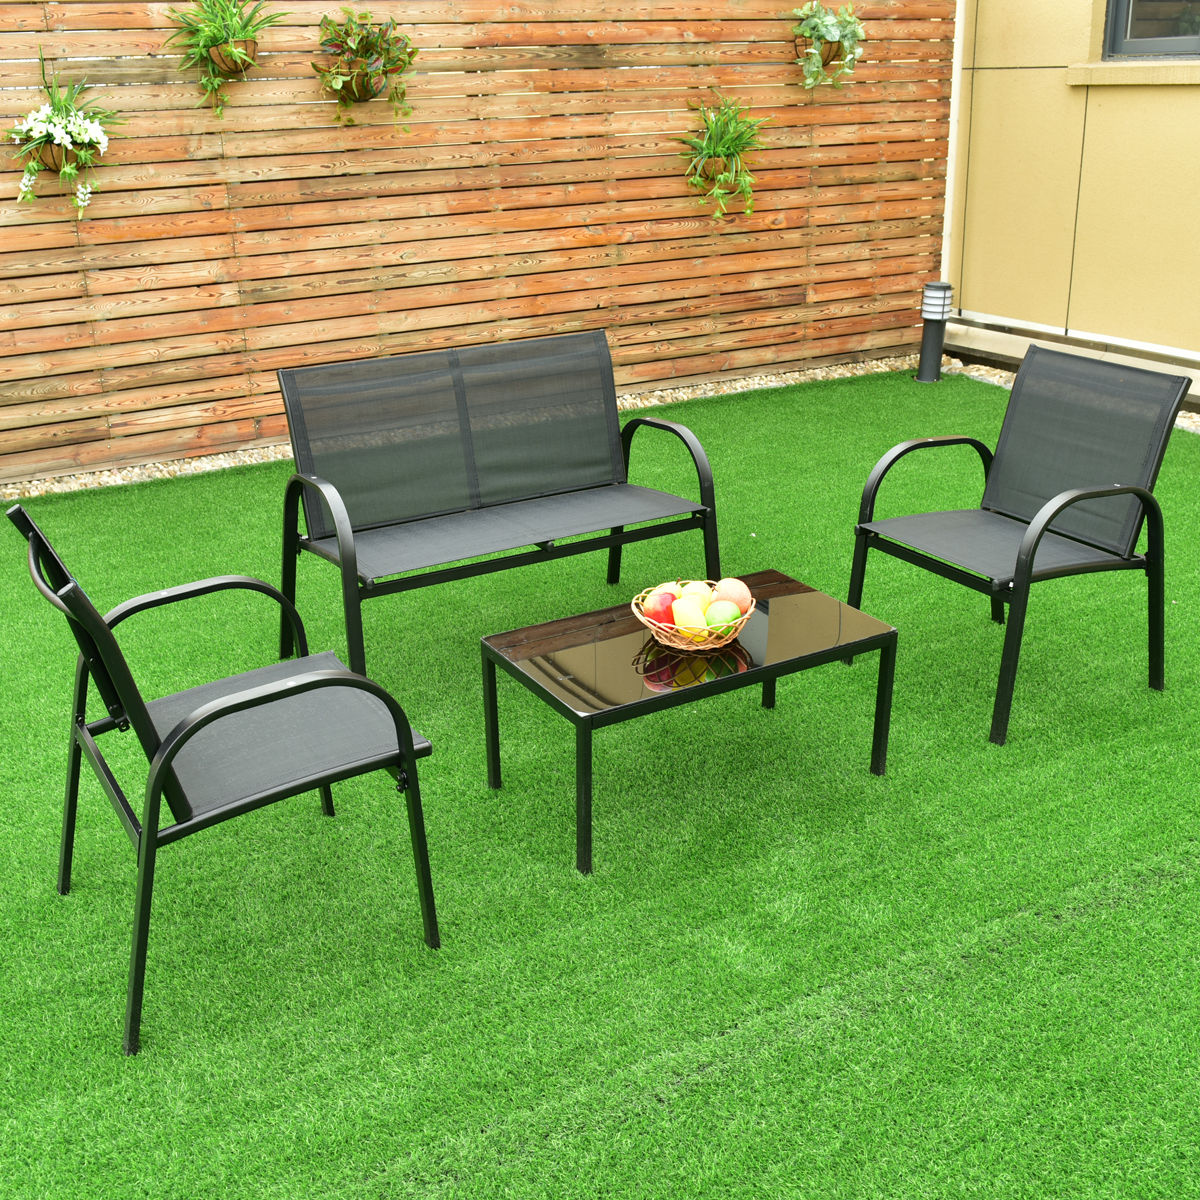 steel frame sofa ikea sectional costway 4 pcs patio furniture set coffee table garden deck black